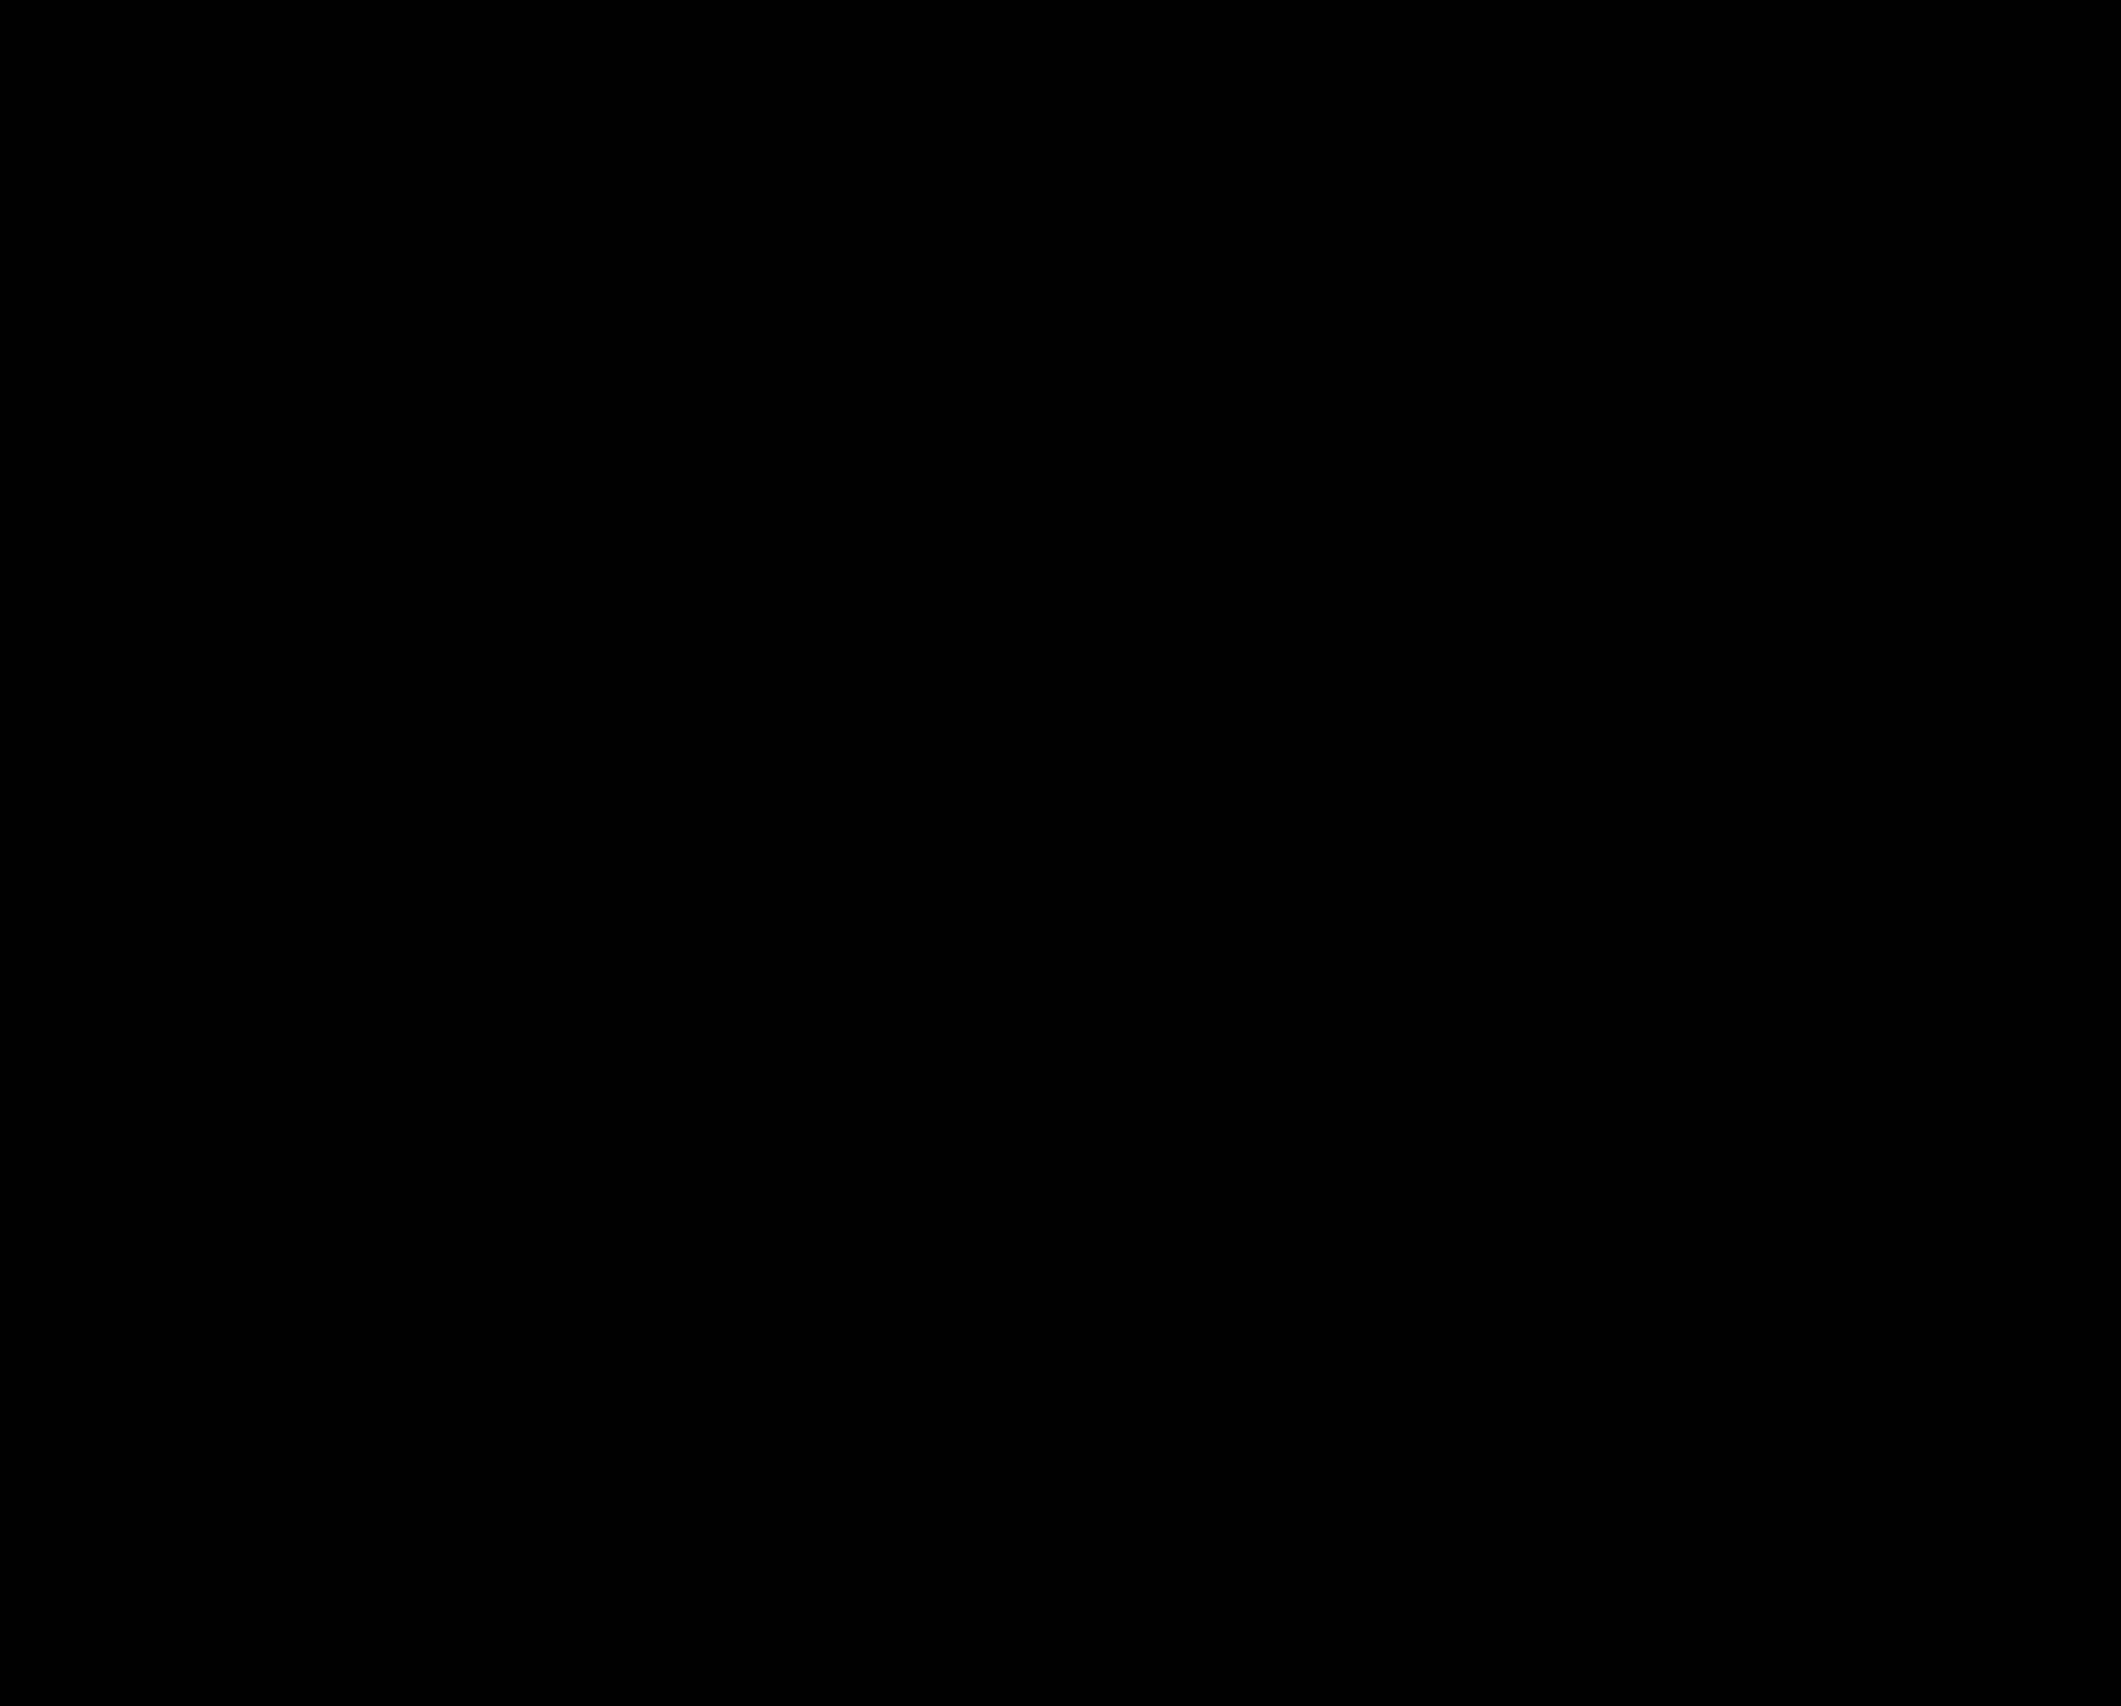 Bolt big image png. Lightning clipart black and white